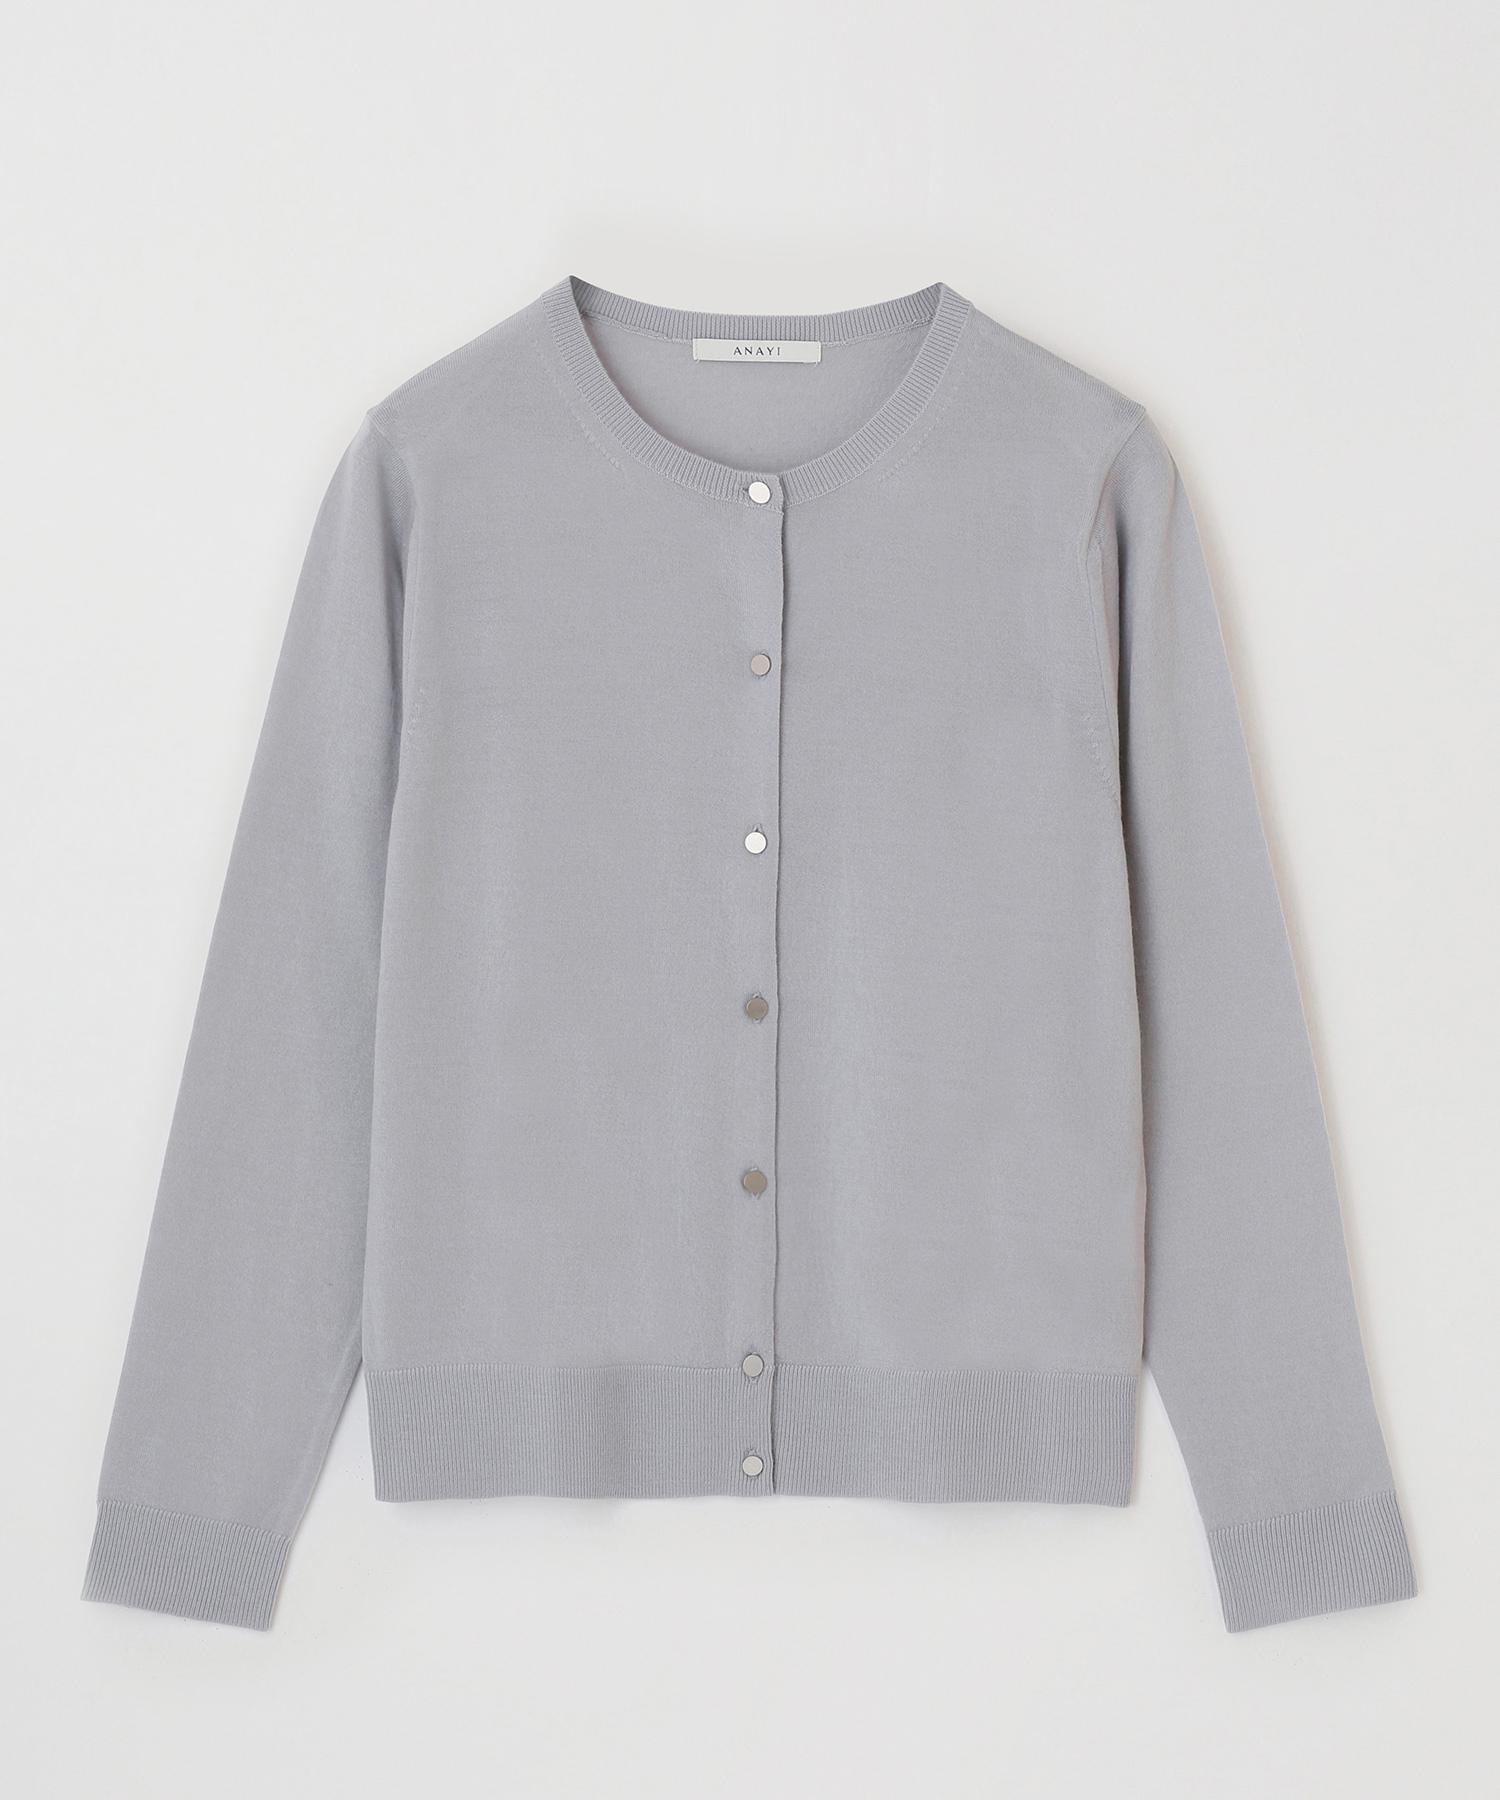 mideum grey